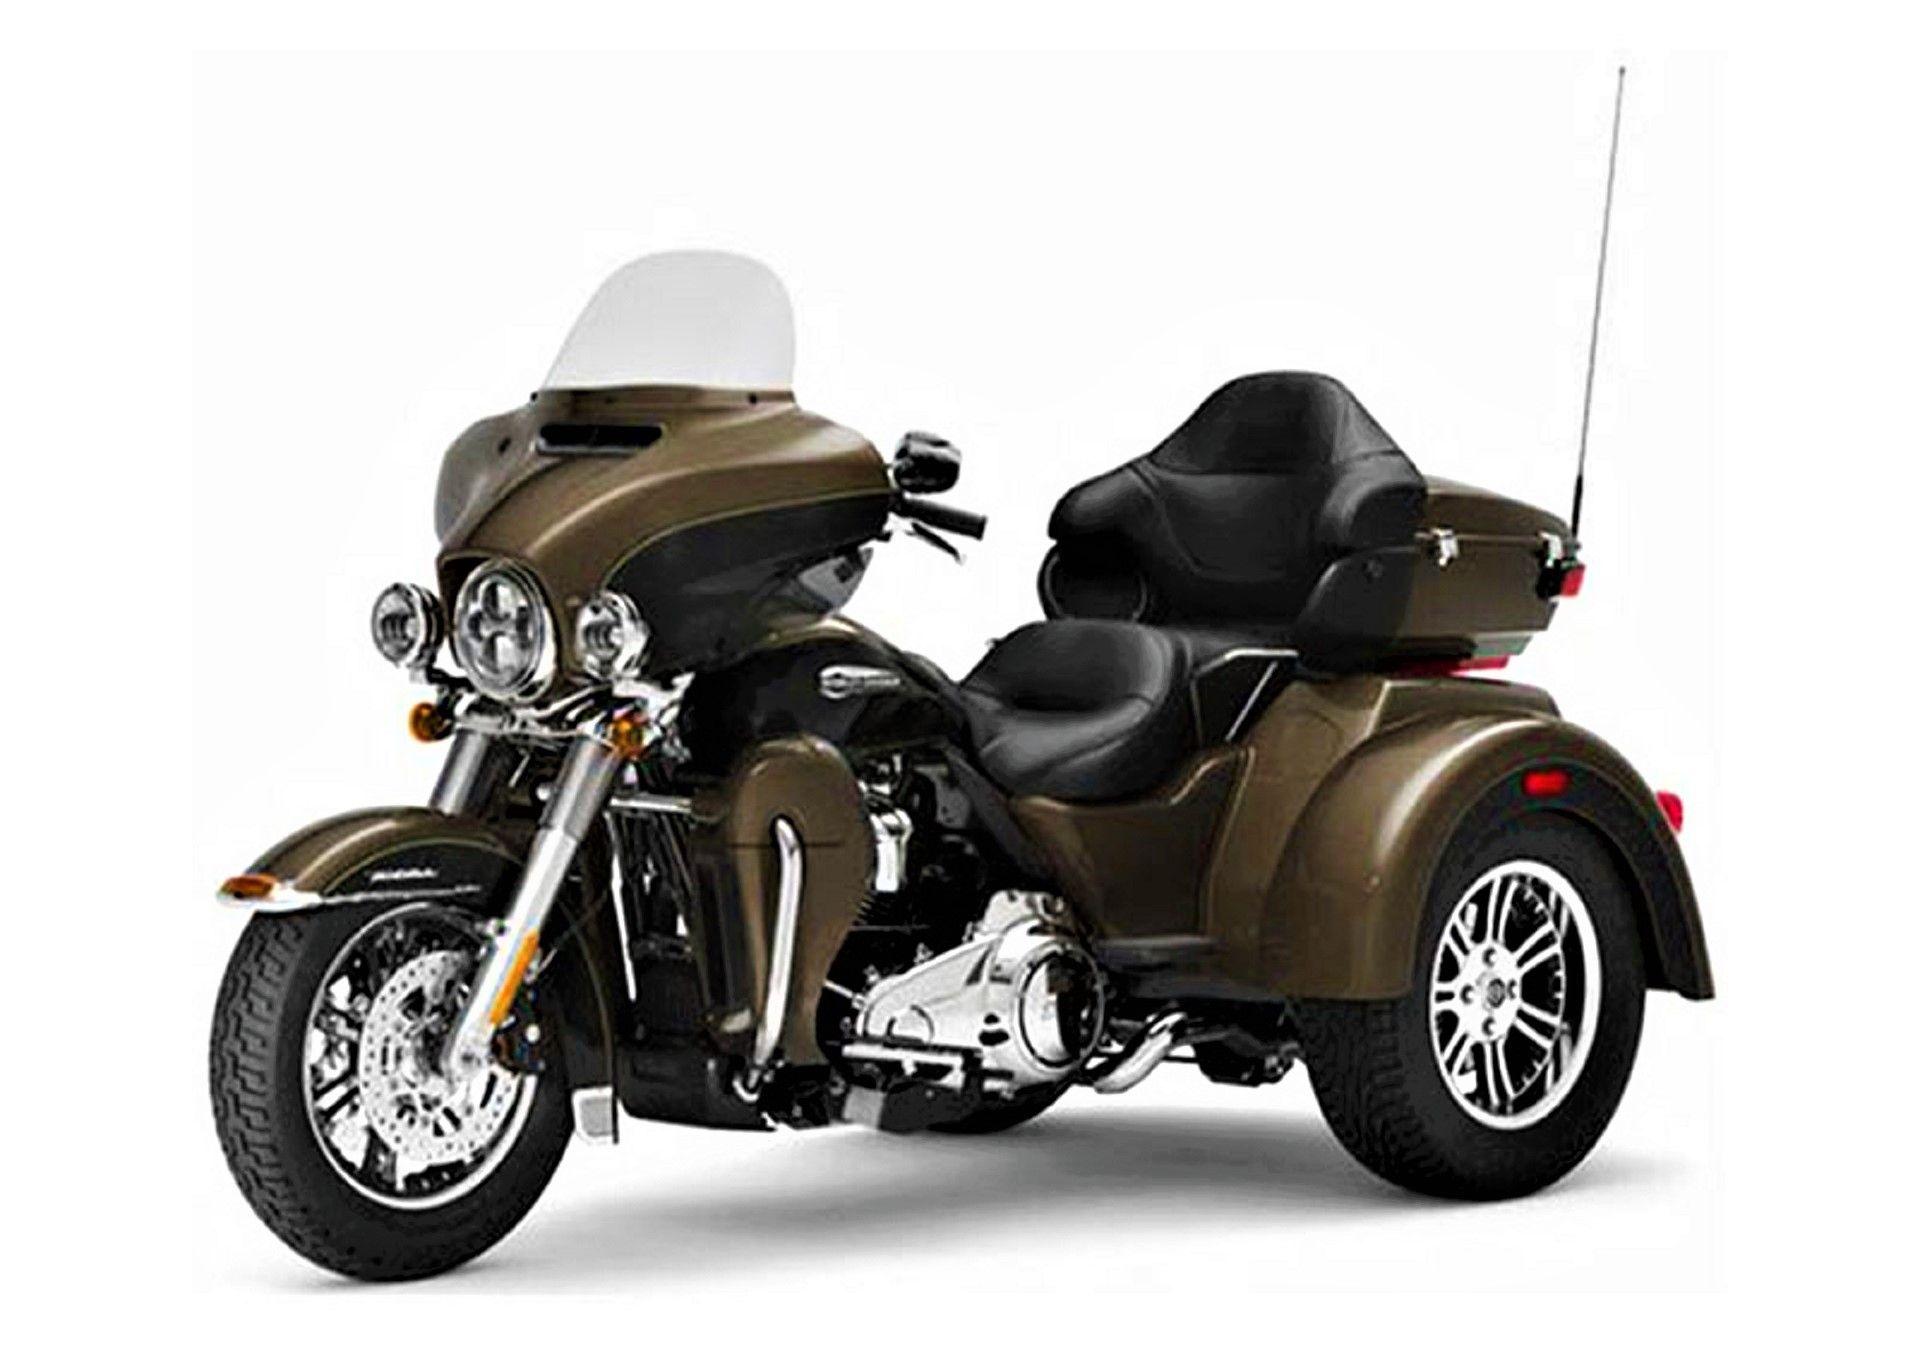 2020 HD Tri Glide Ultra in 2020 Harley davidson, Harley